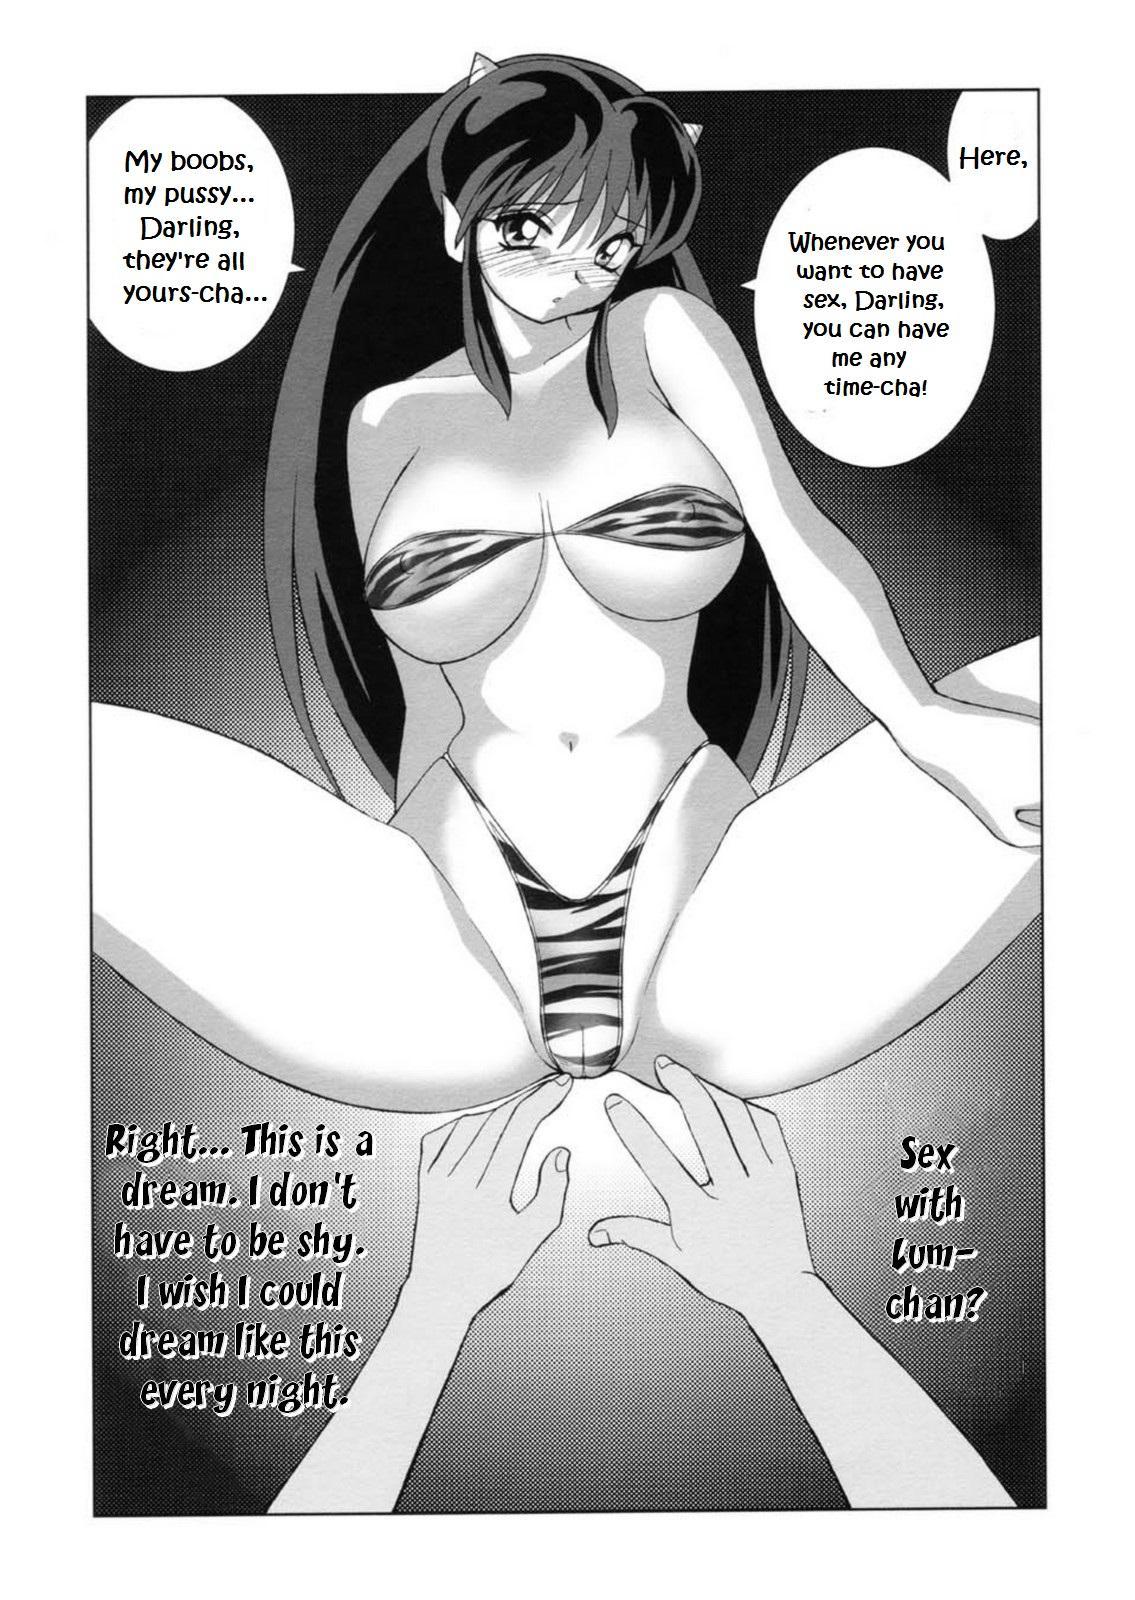 Suki Suki Lumchan | Lovely Lovely Lum-chan 12